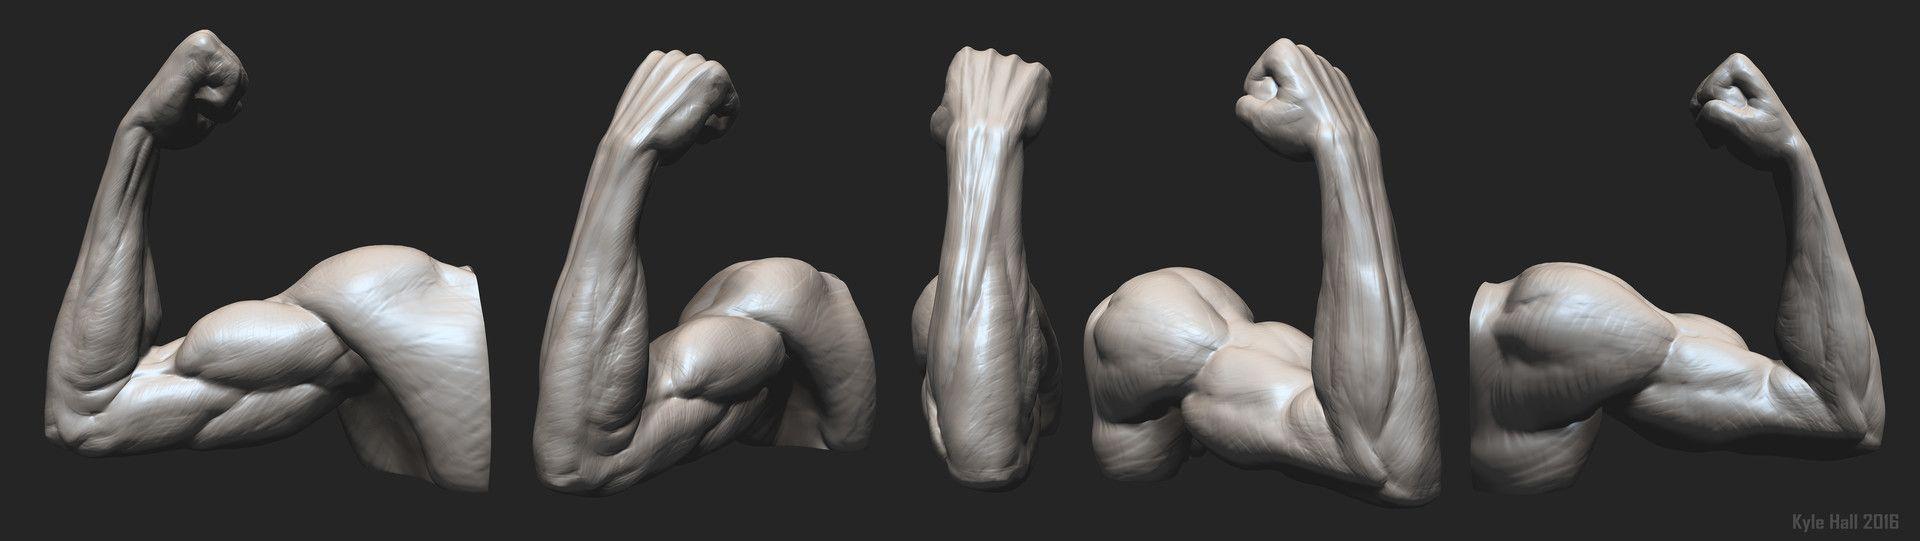 ArtStation - Arm Anatomy Study - Flexed Supinated, Kyle Hall